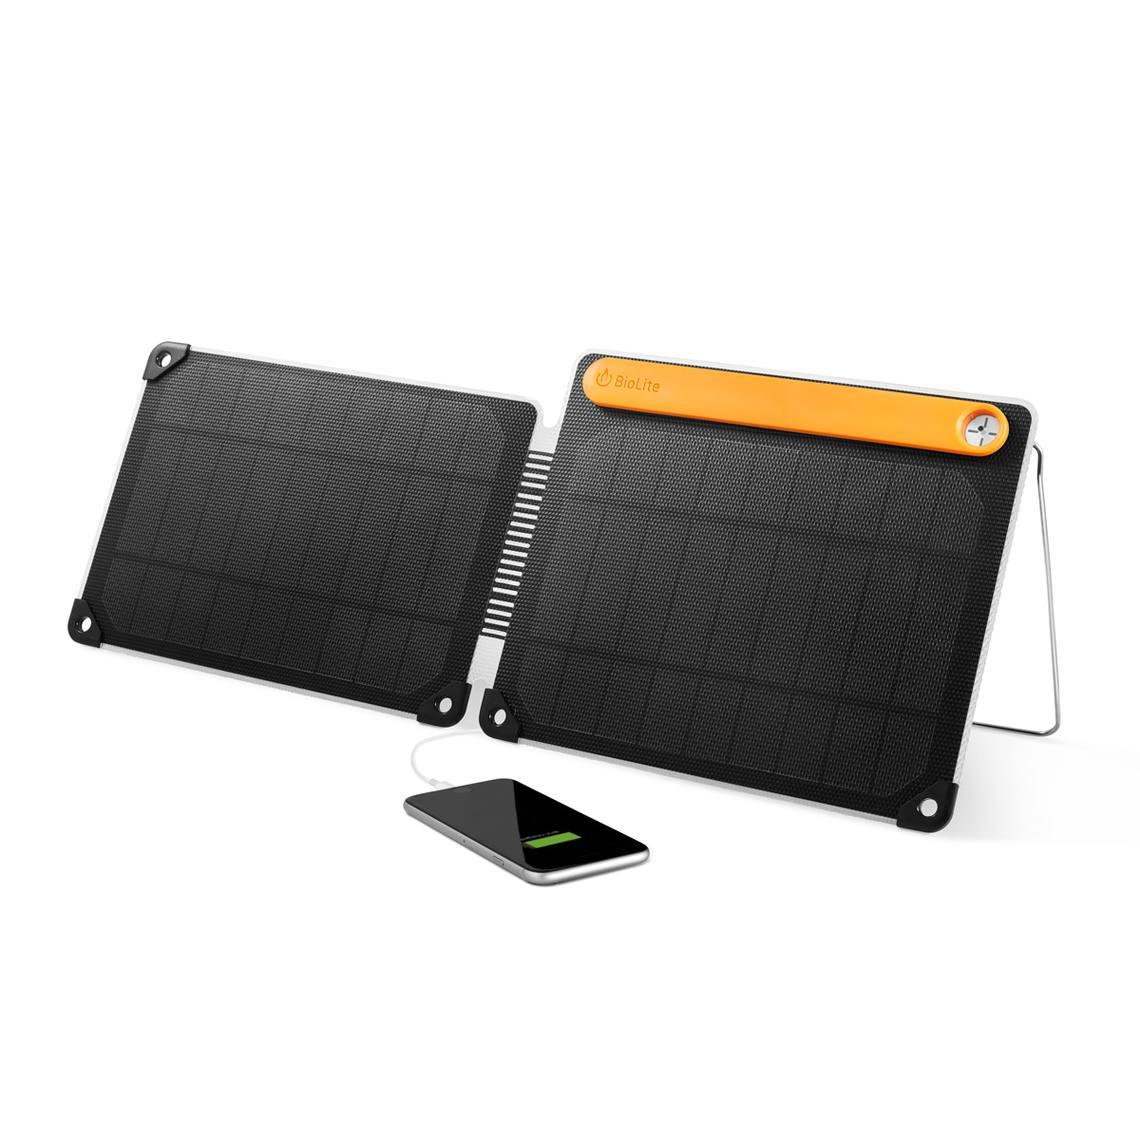 Солнечная Батарея Biolite SolarPanel 10+ SPC1001